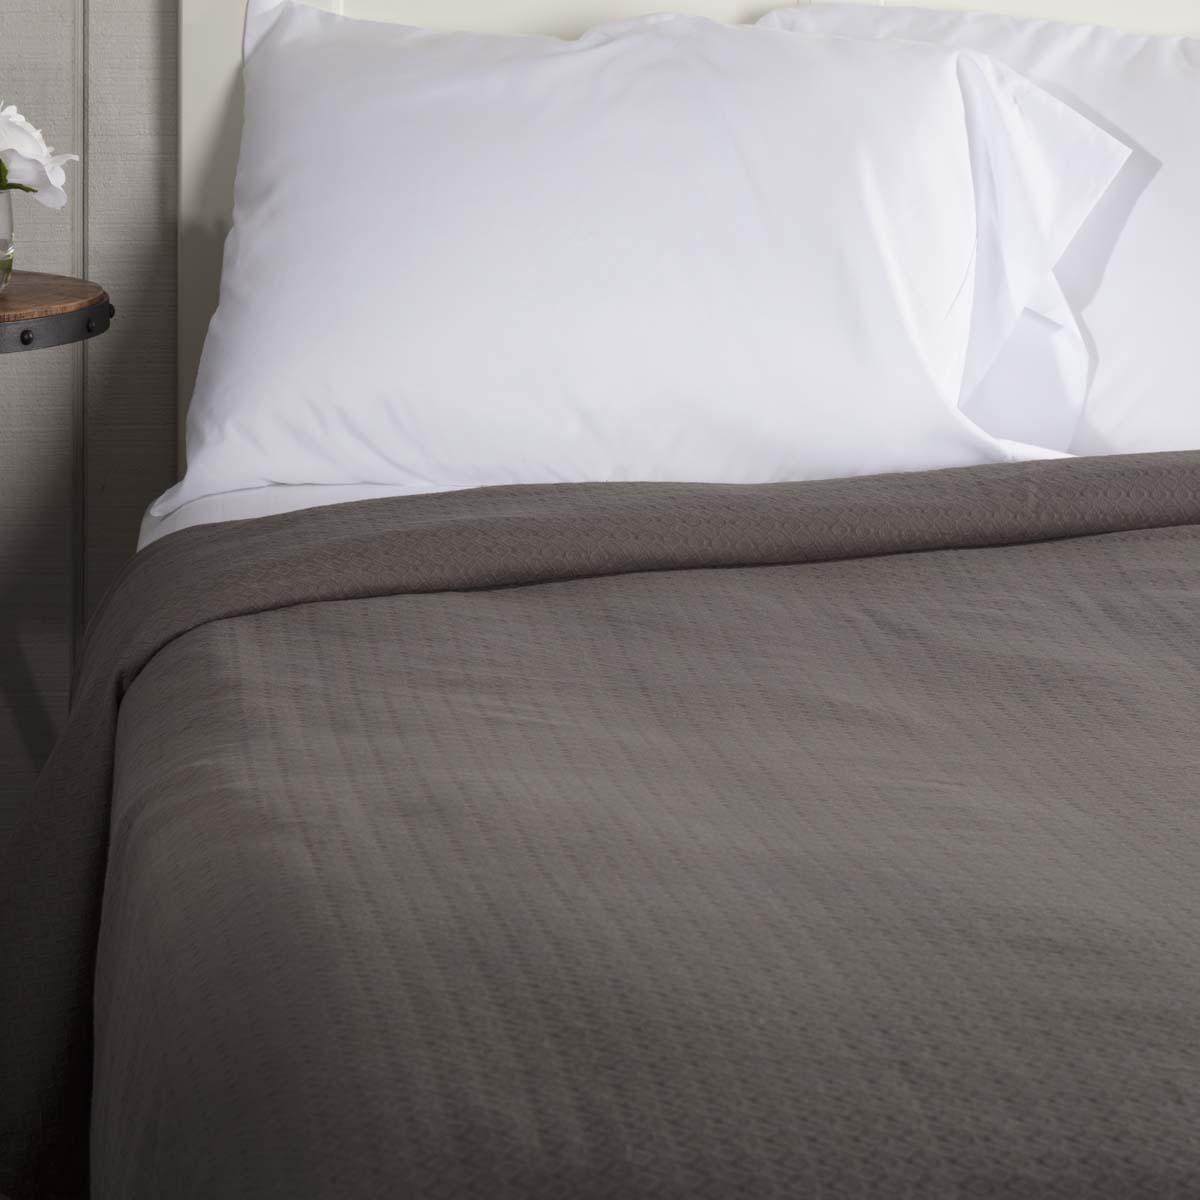 SERENITY grau King Cotton Woven Blanket Coverlet Farmhouse Bedding VHC Brands